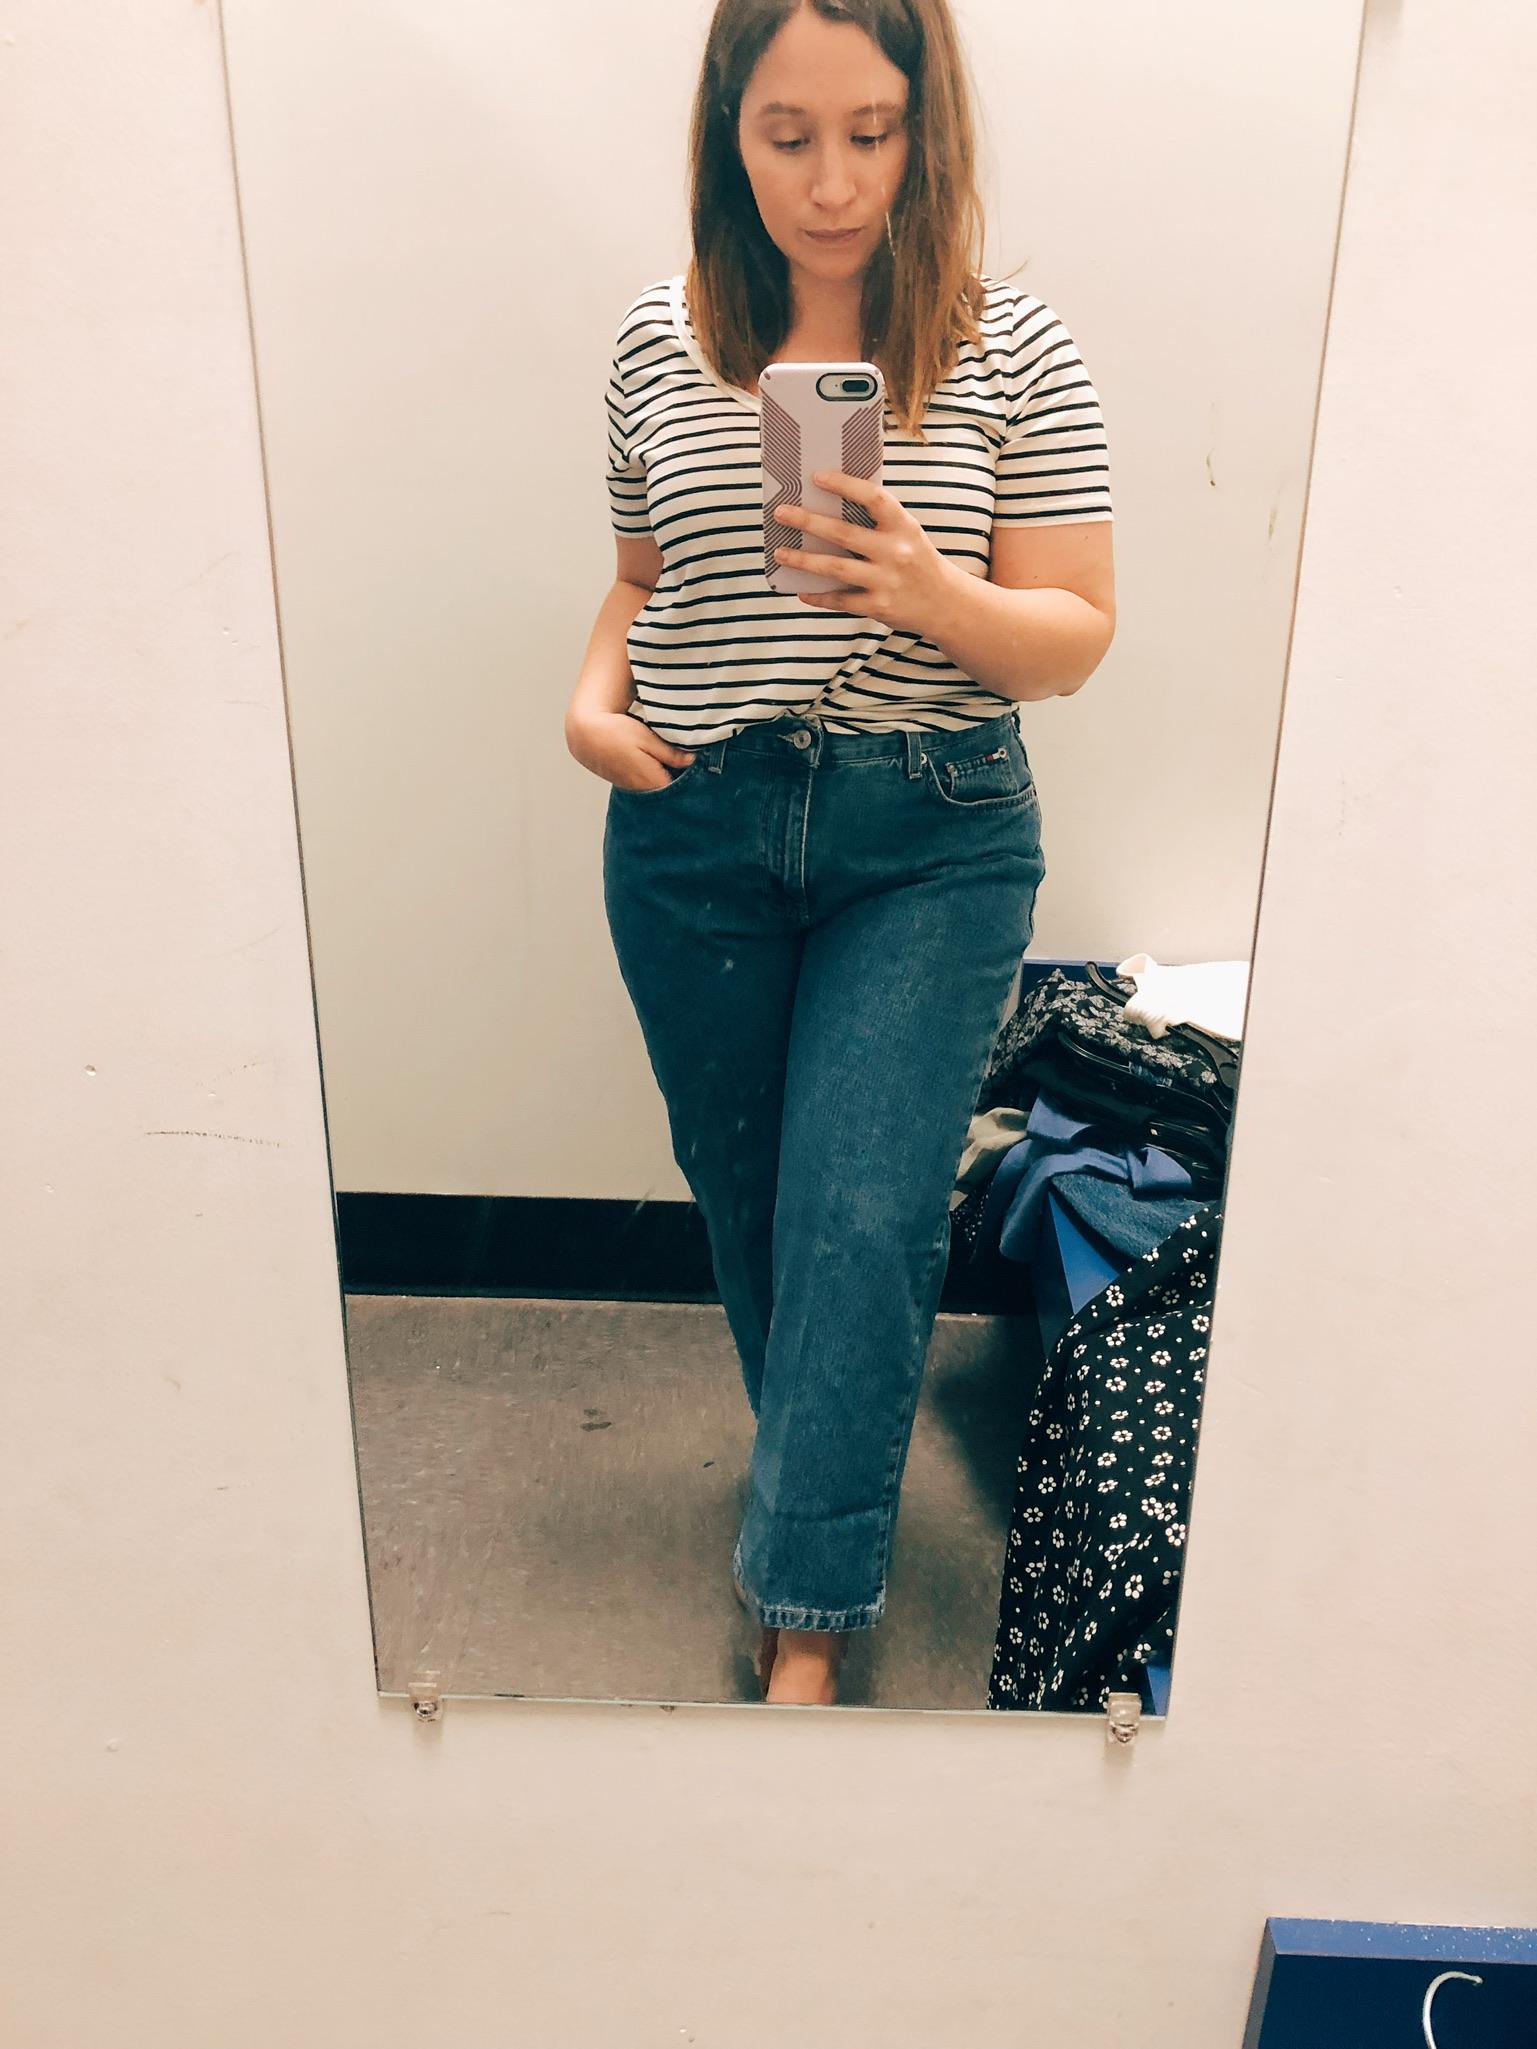 Vintage Tommy Hilfiger Jeans, Thrift Shopping Tips